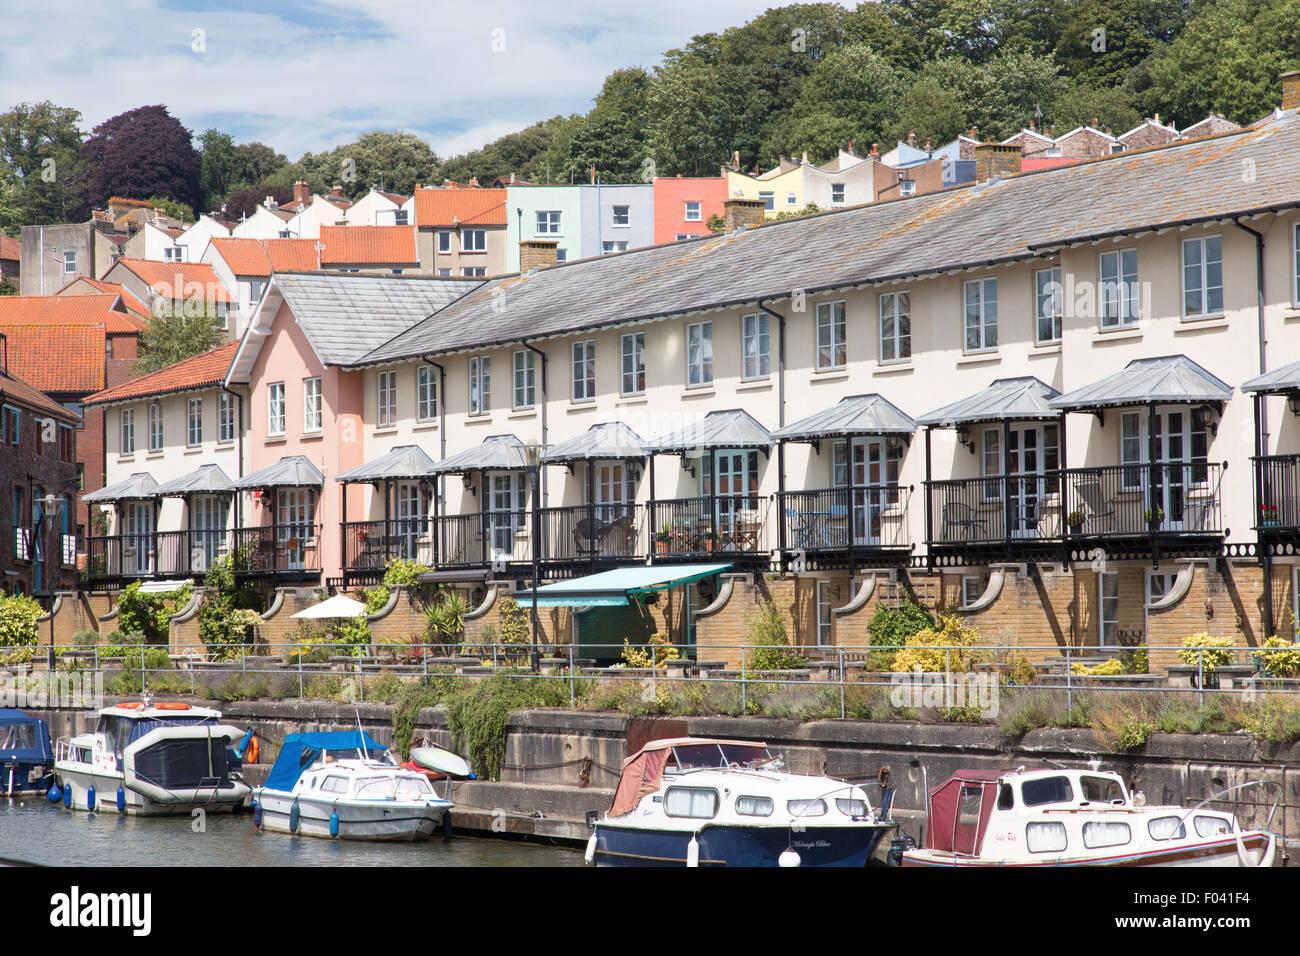 Apartments overlooking Bristol Harbour, England, UK - Stock Image